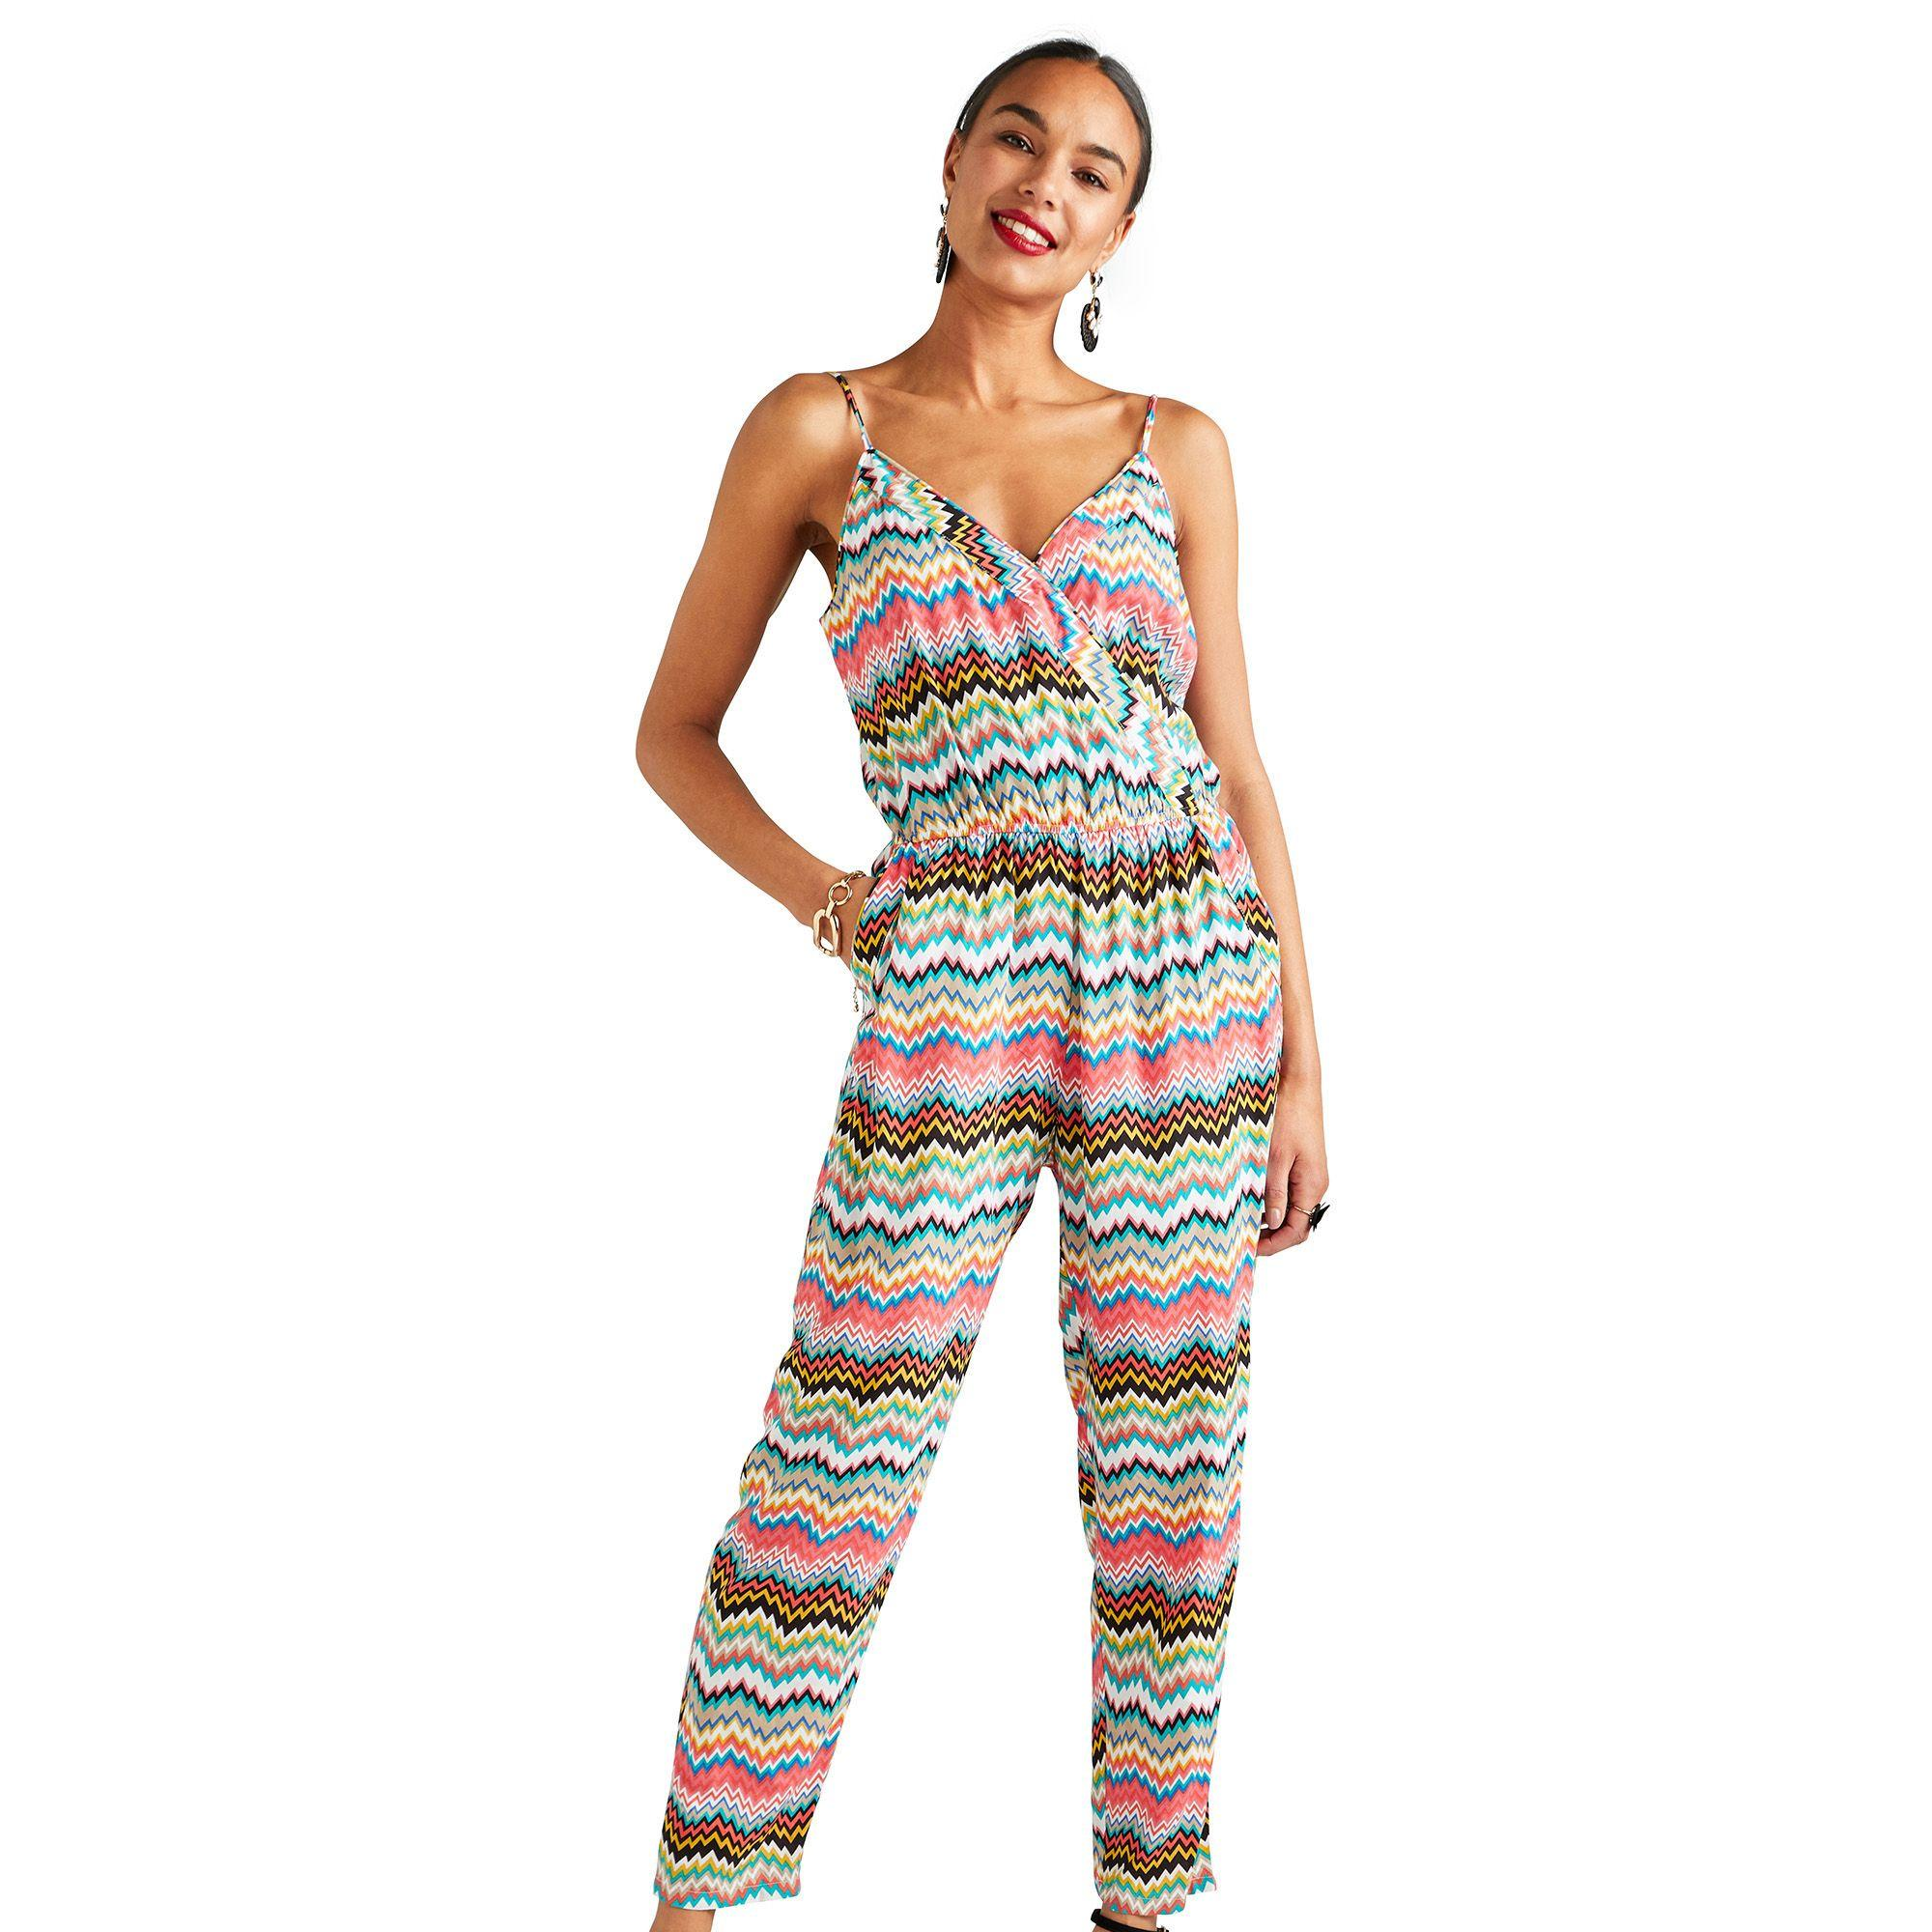 802a6c7620 Yumi . Women s Multicoloured Zigzag Print Jumpsuit